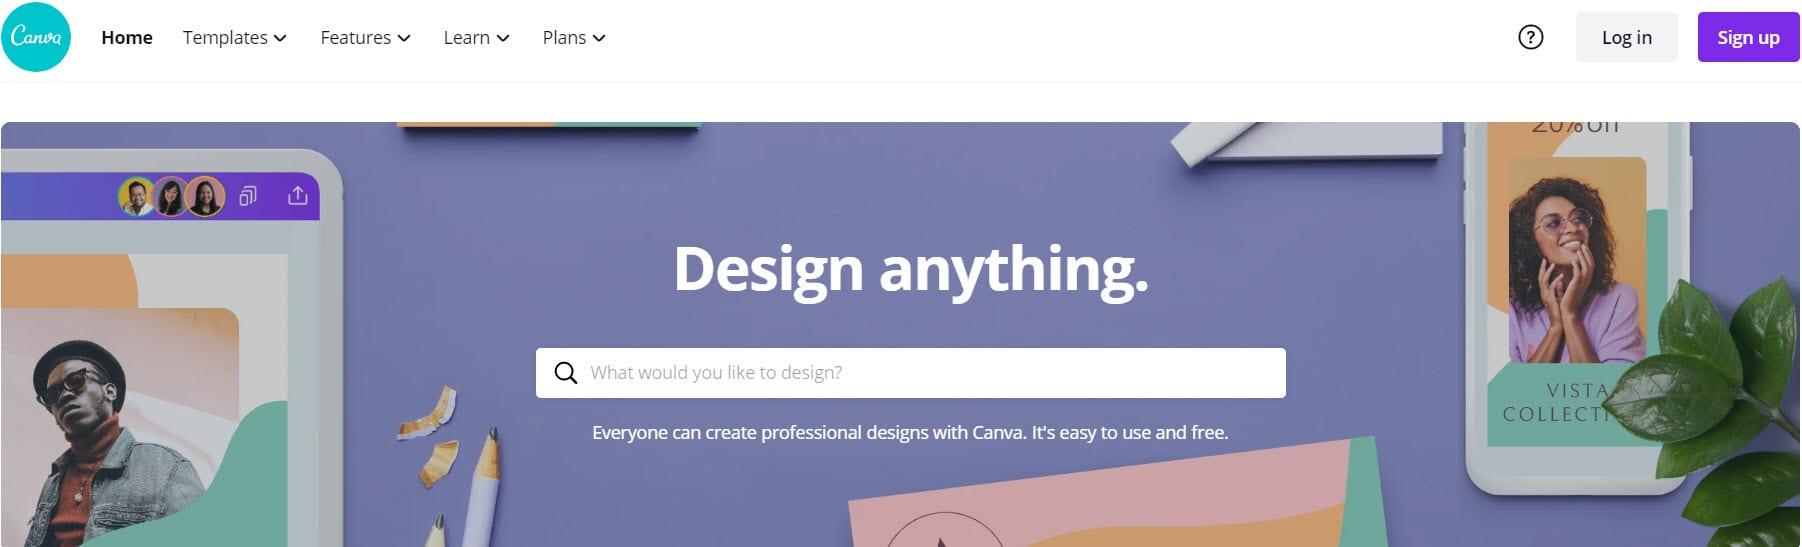 Canva header design